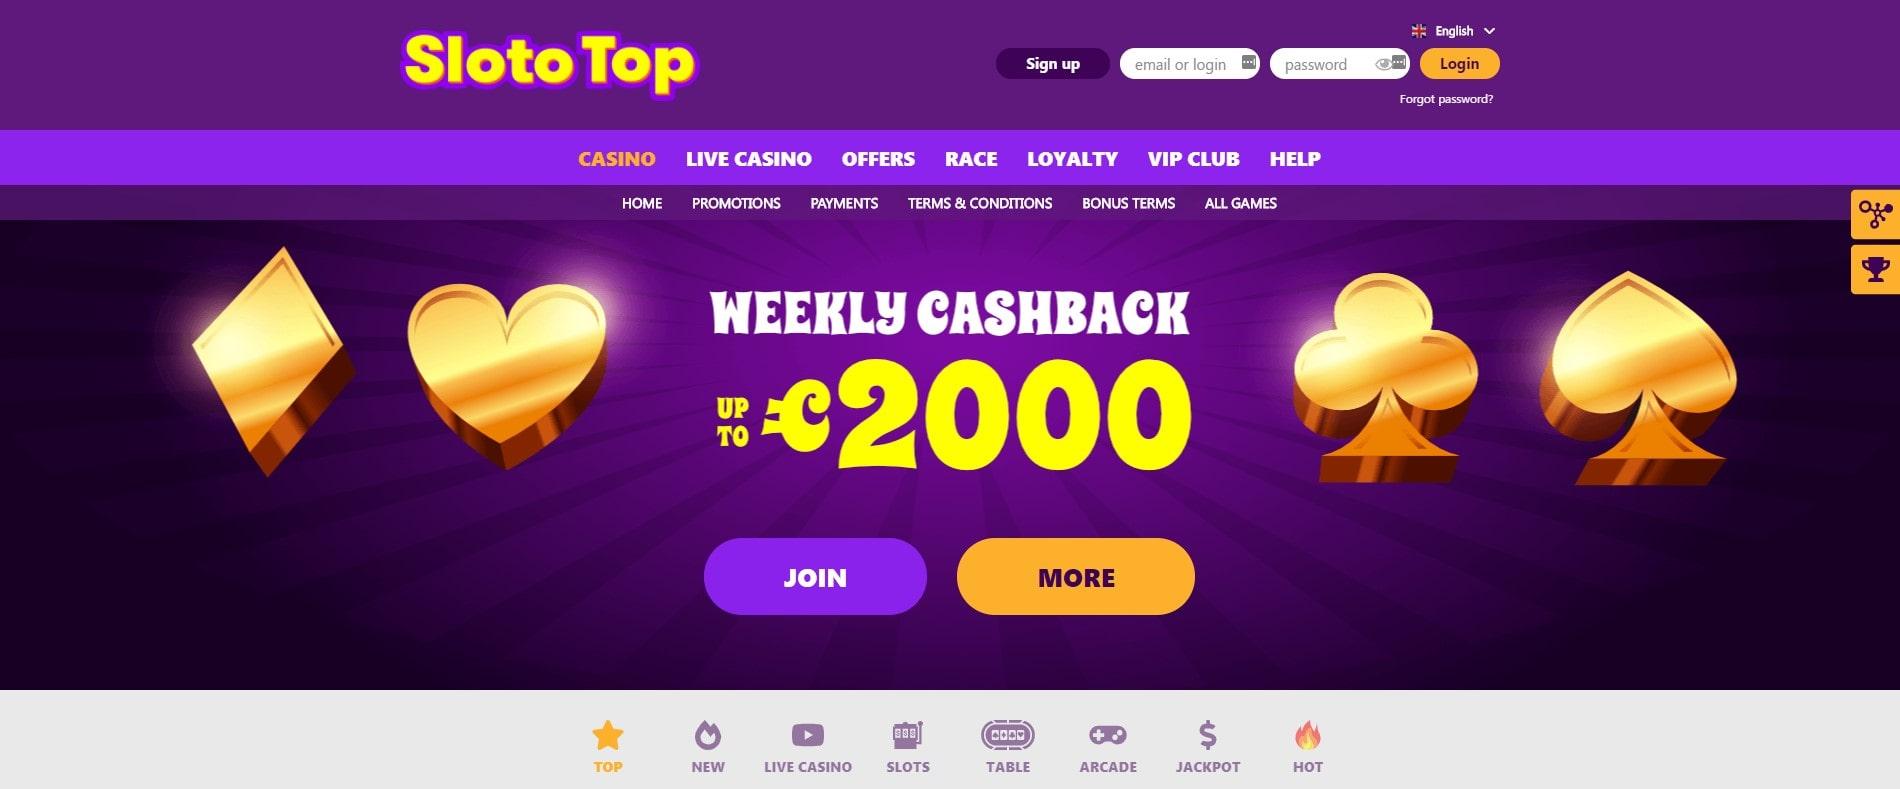 Slototop Casino Webseite